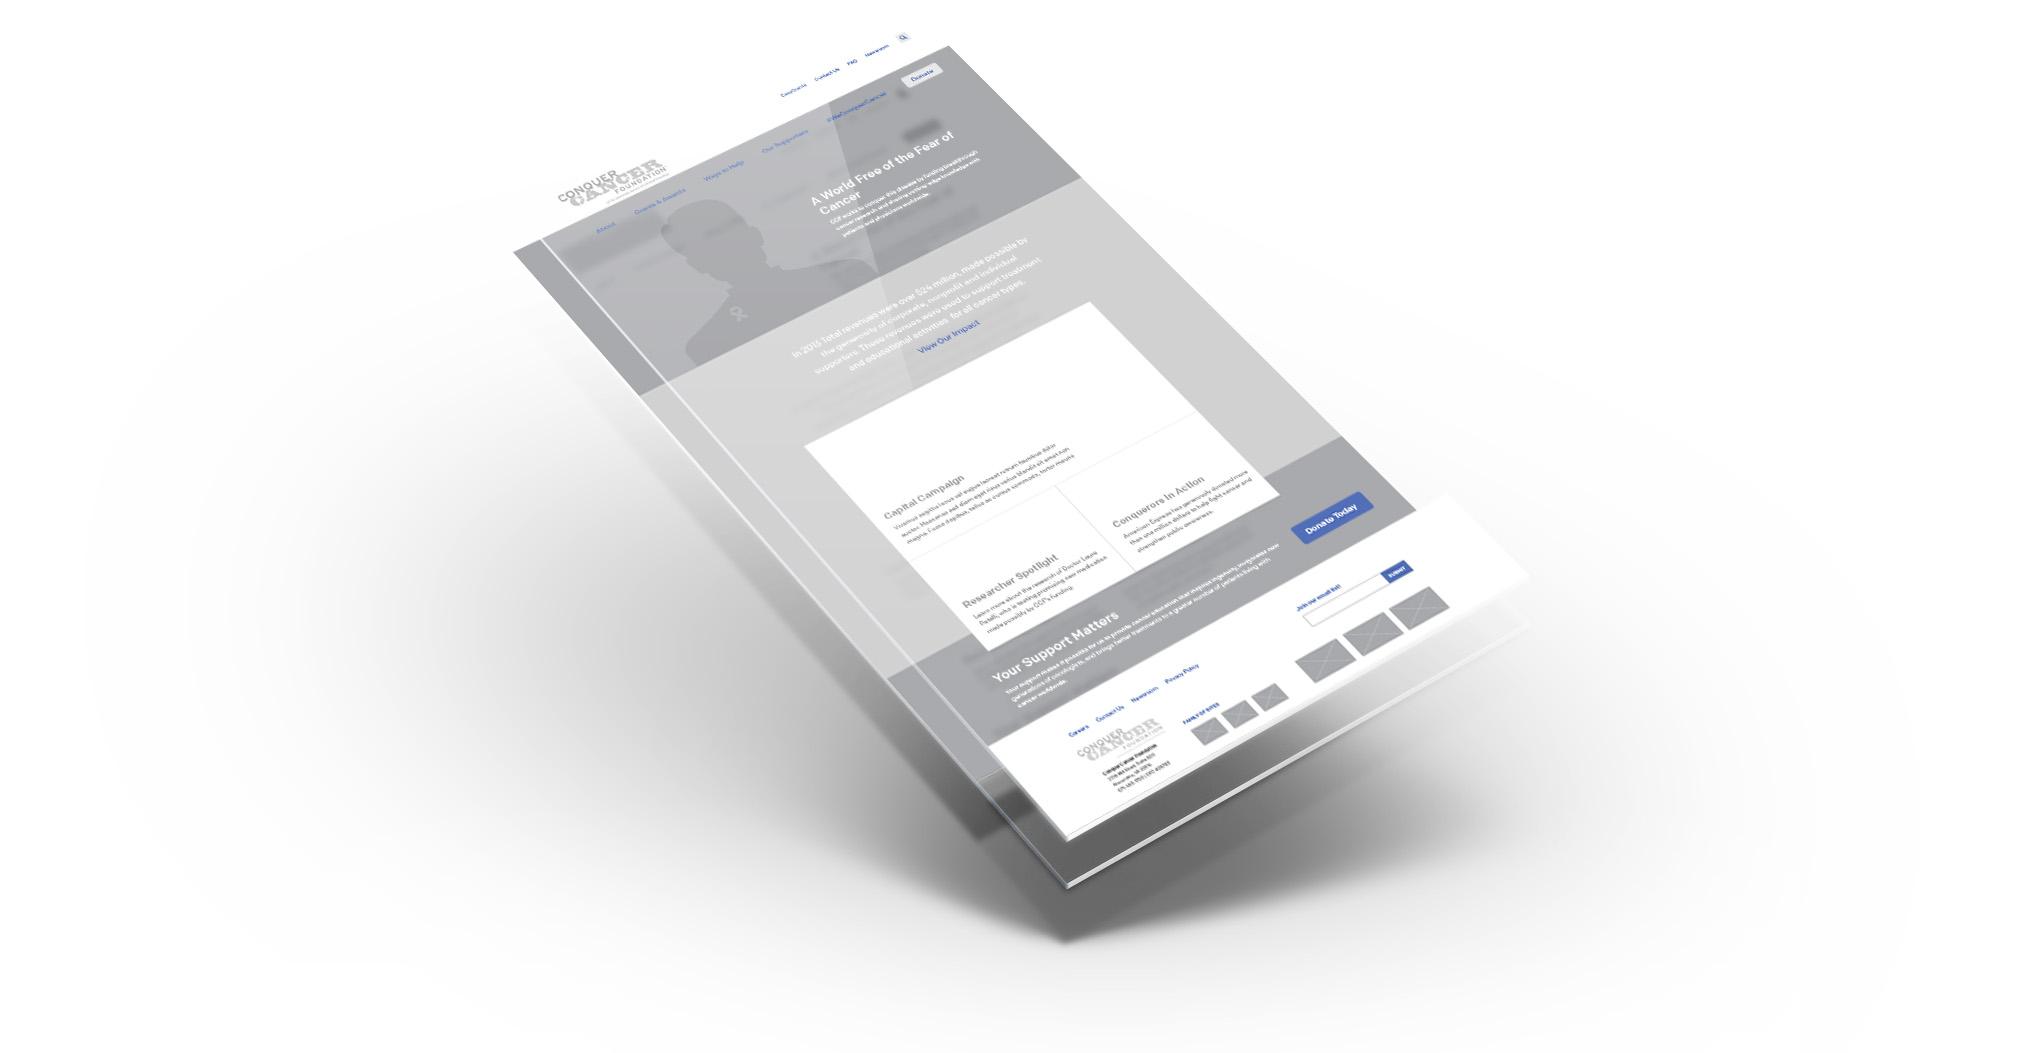 Conquer Cancer Foundation mobile design layer comps